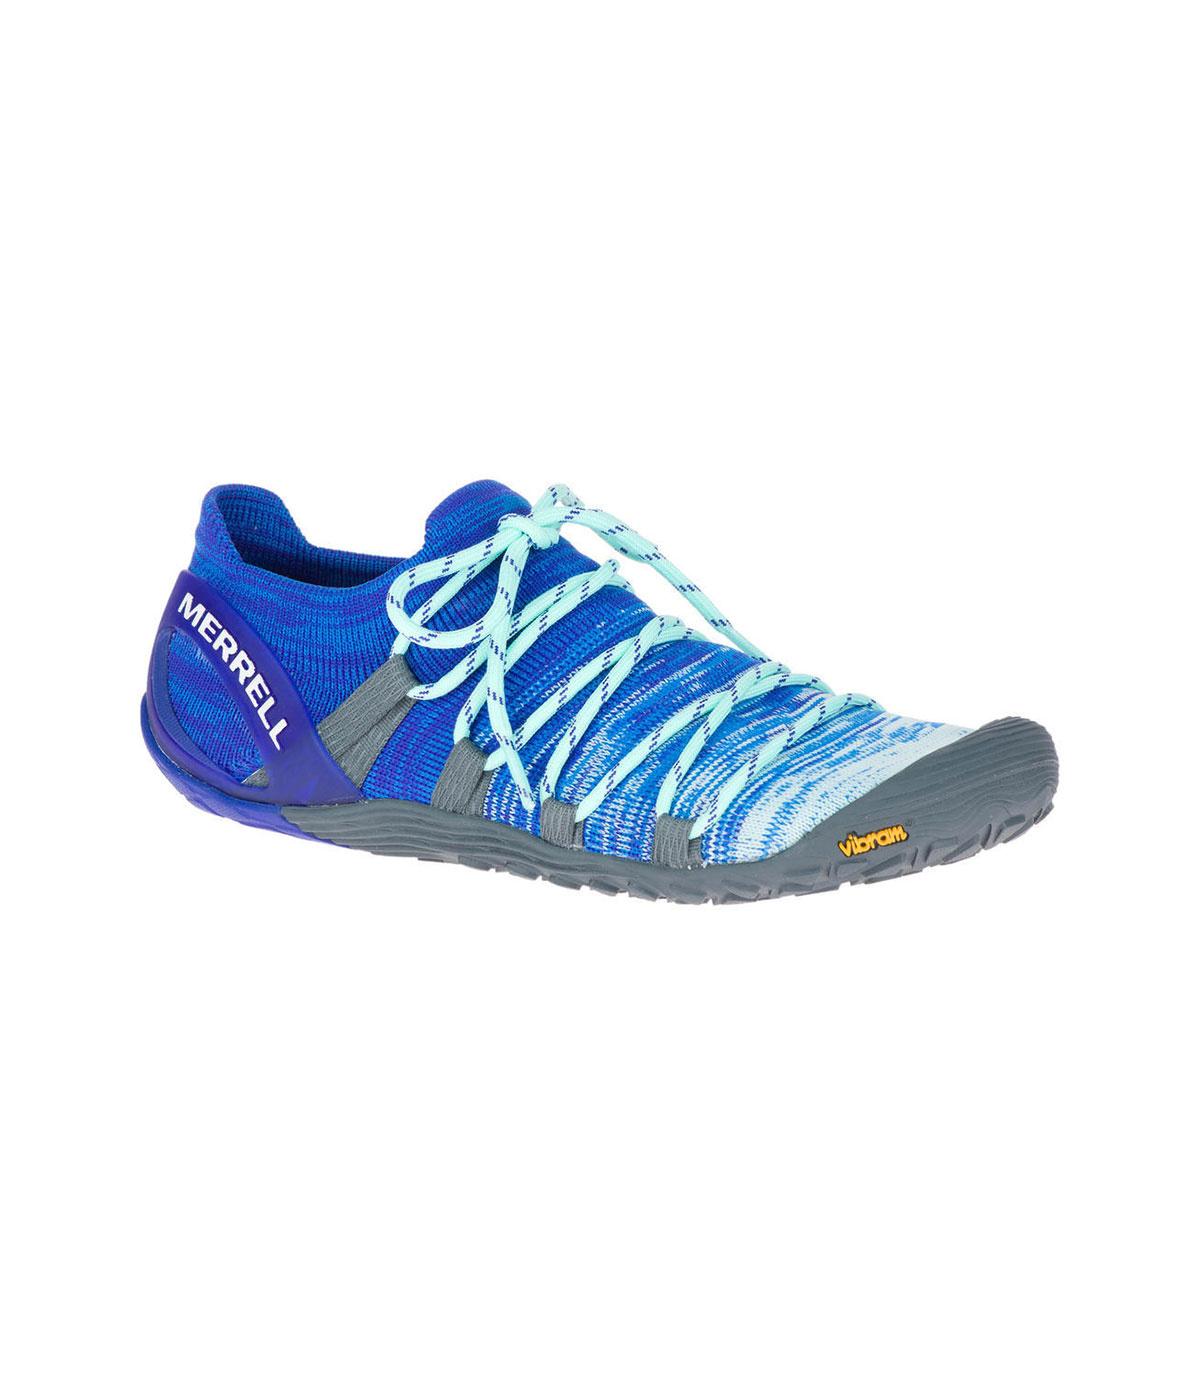 Merrell vapor glove 4 3d aqua surf bleu j 52512